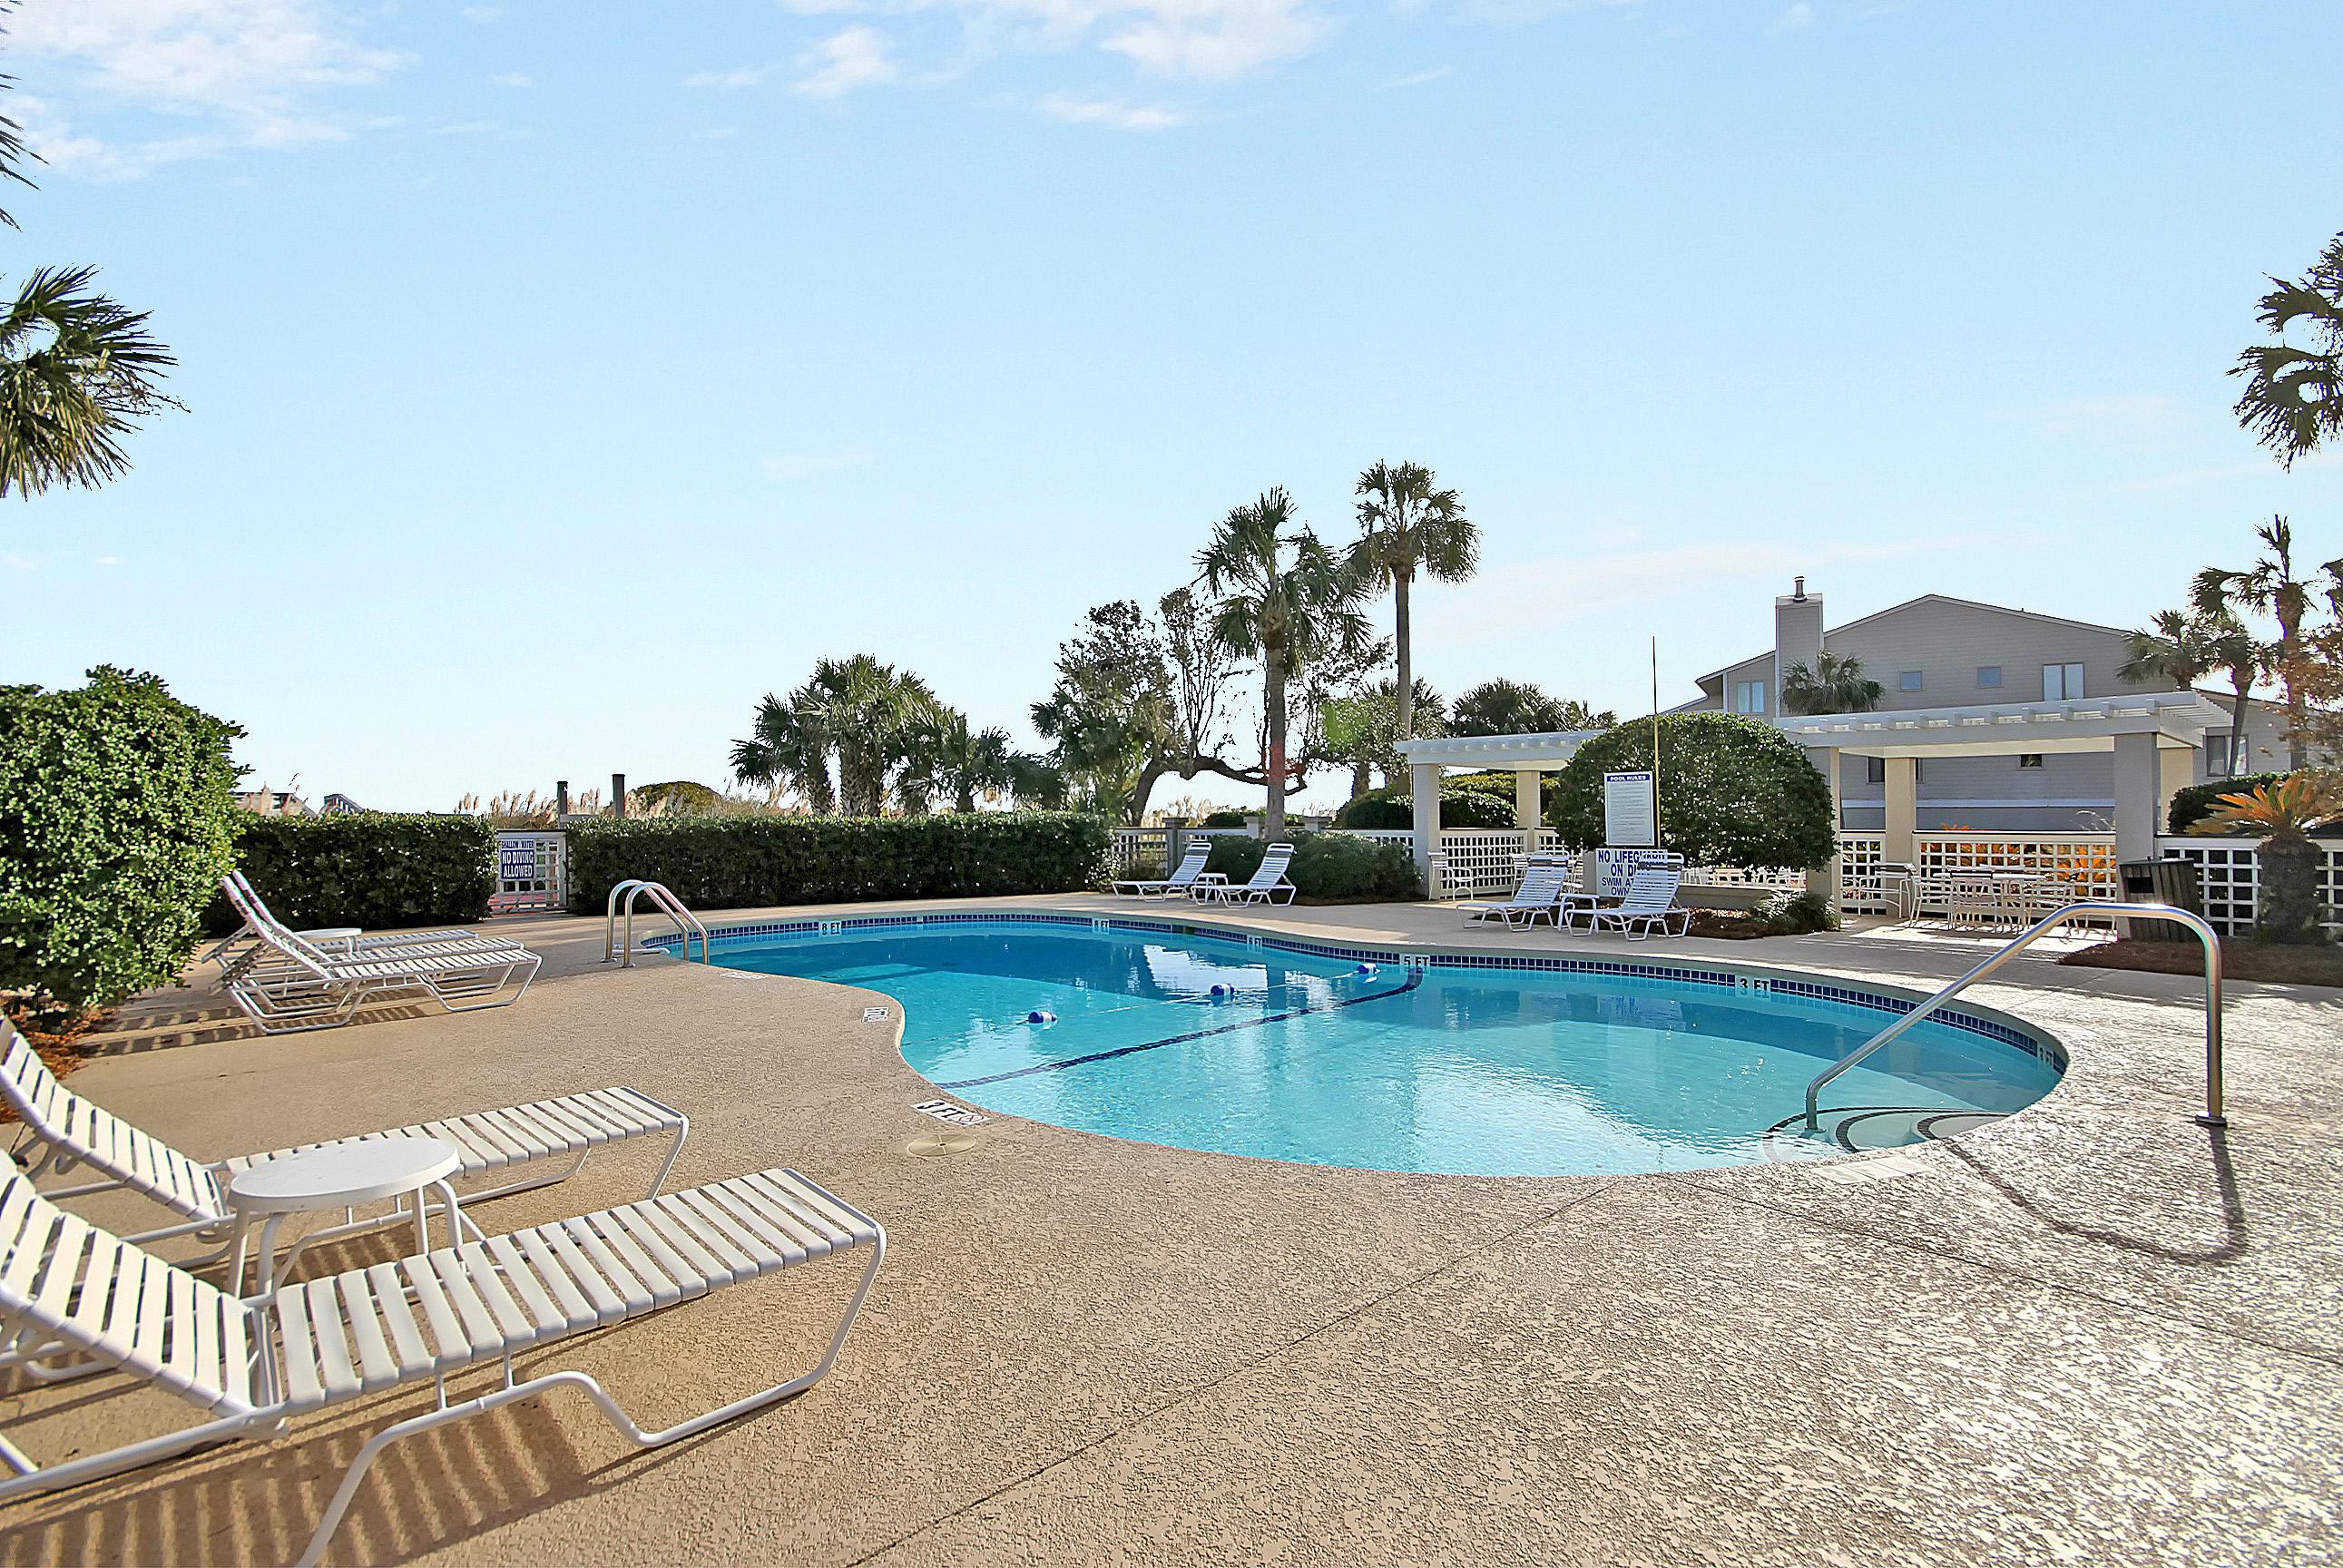 46 Beach Club Villas Isle Of Palms, SC 29451